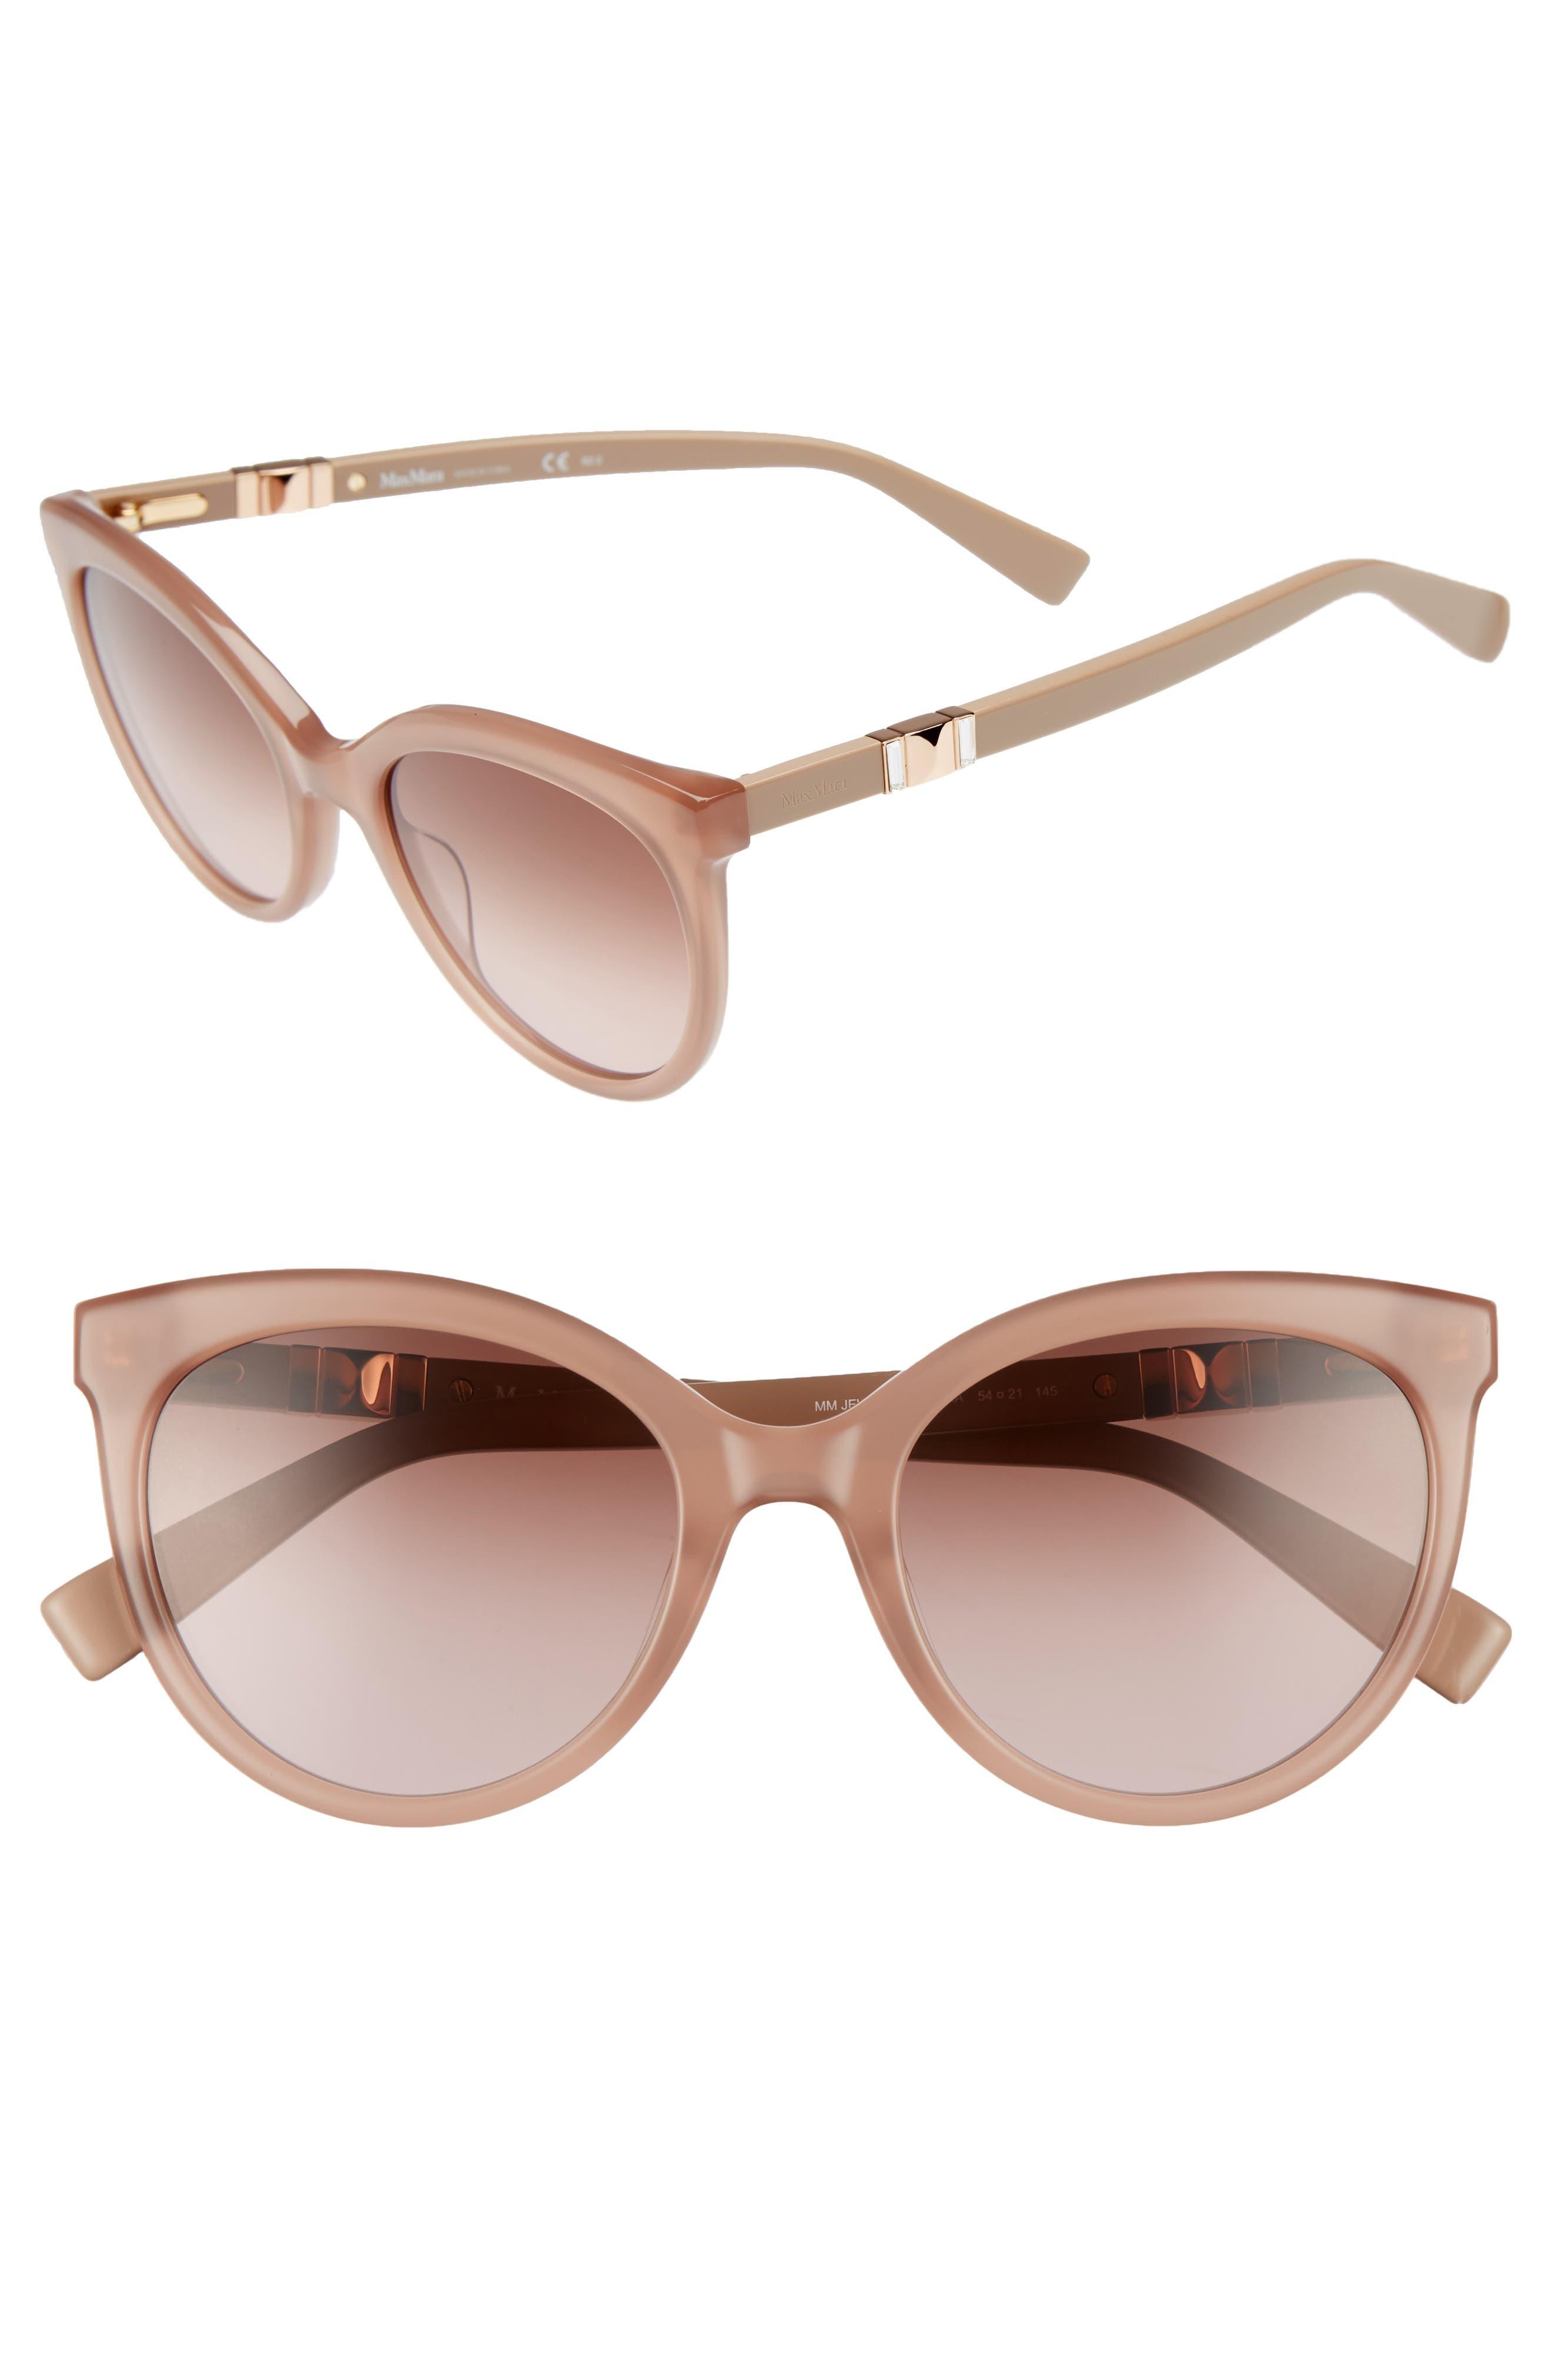 Main Image - Max Mara Jeweliis 54mm Gradient Cat Eye Sunglasses